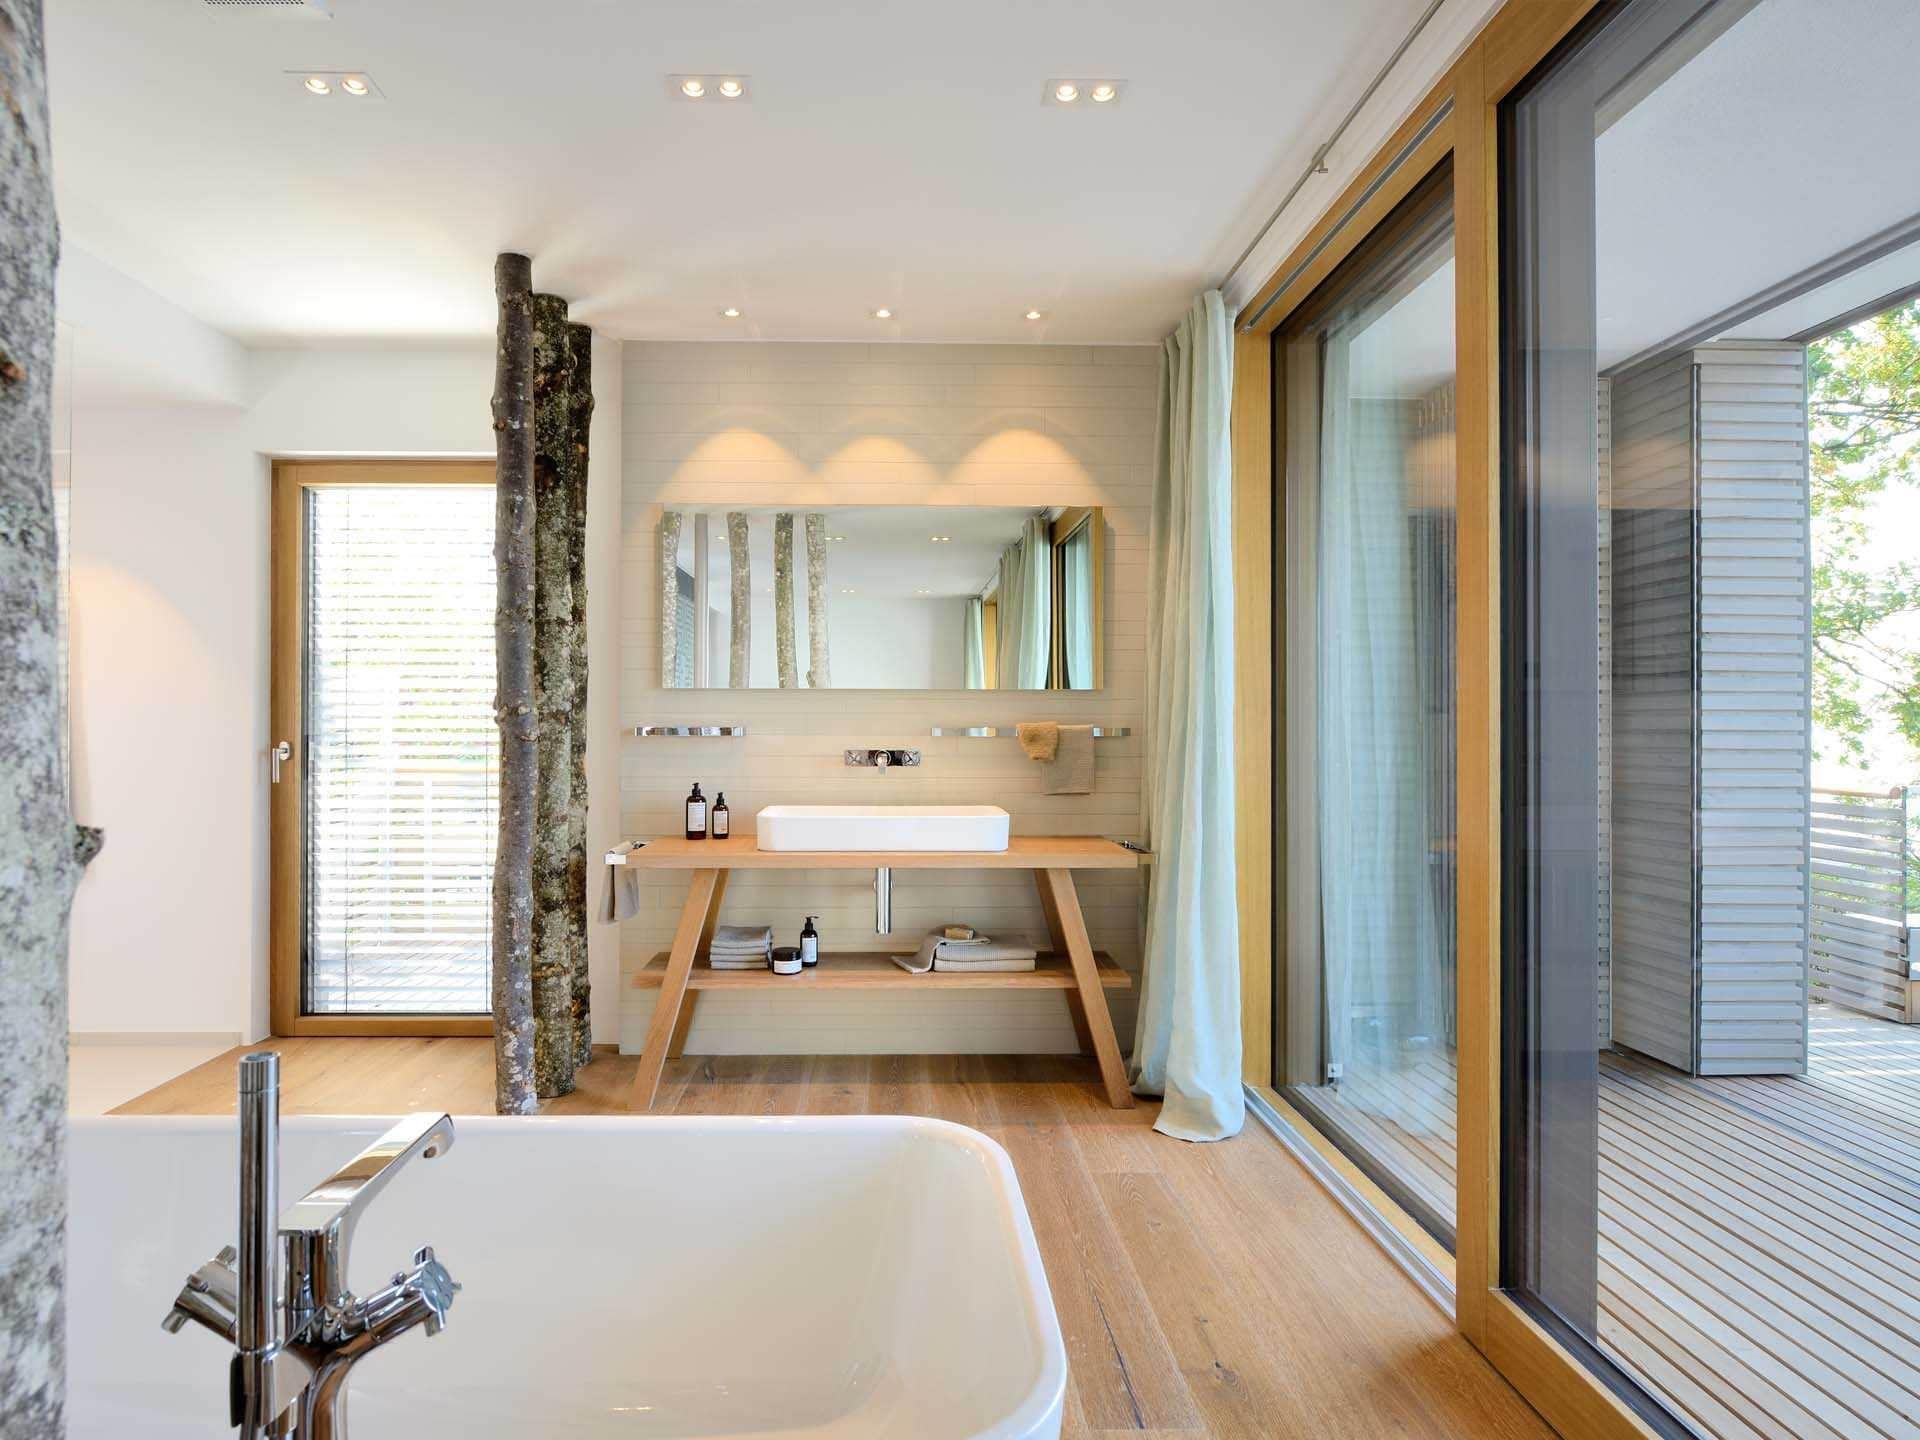 Musterhaus badezimmer  Baufritz Musterhaus Haus am See Ansicht Badezimmer | Haus Pläne ...